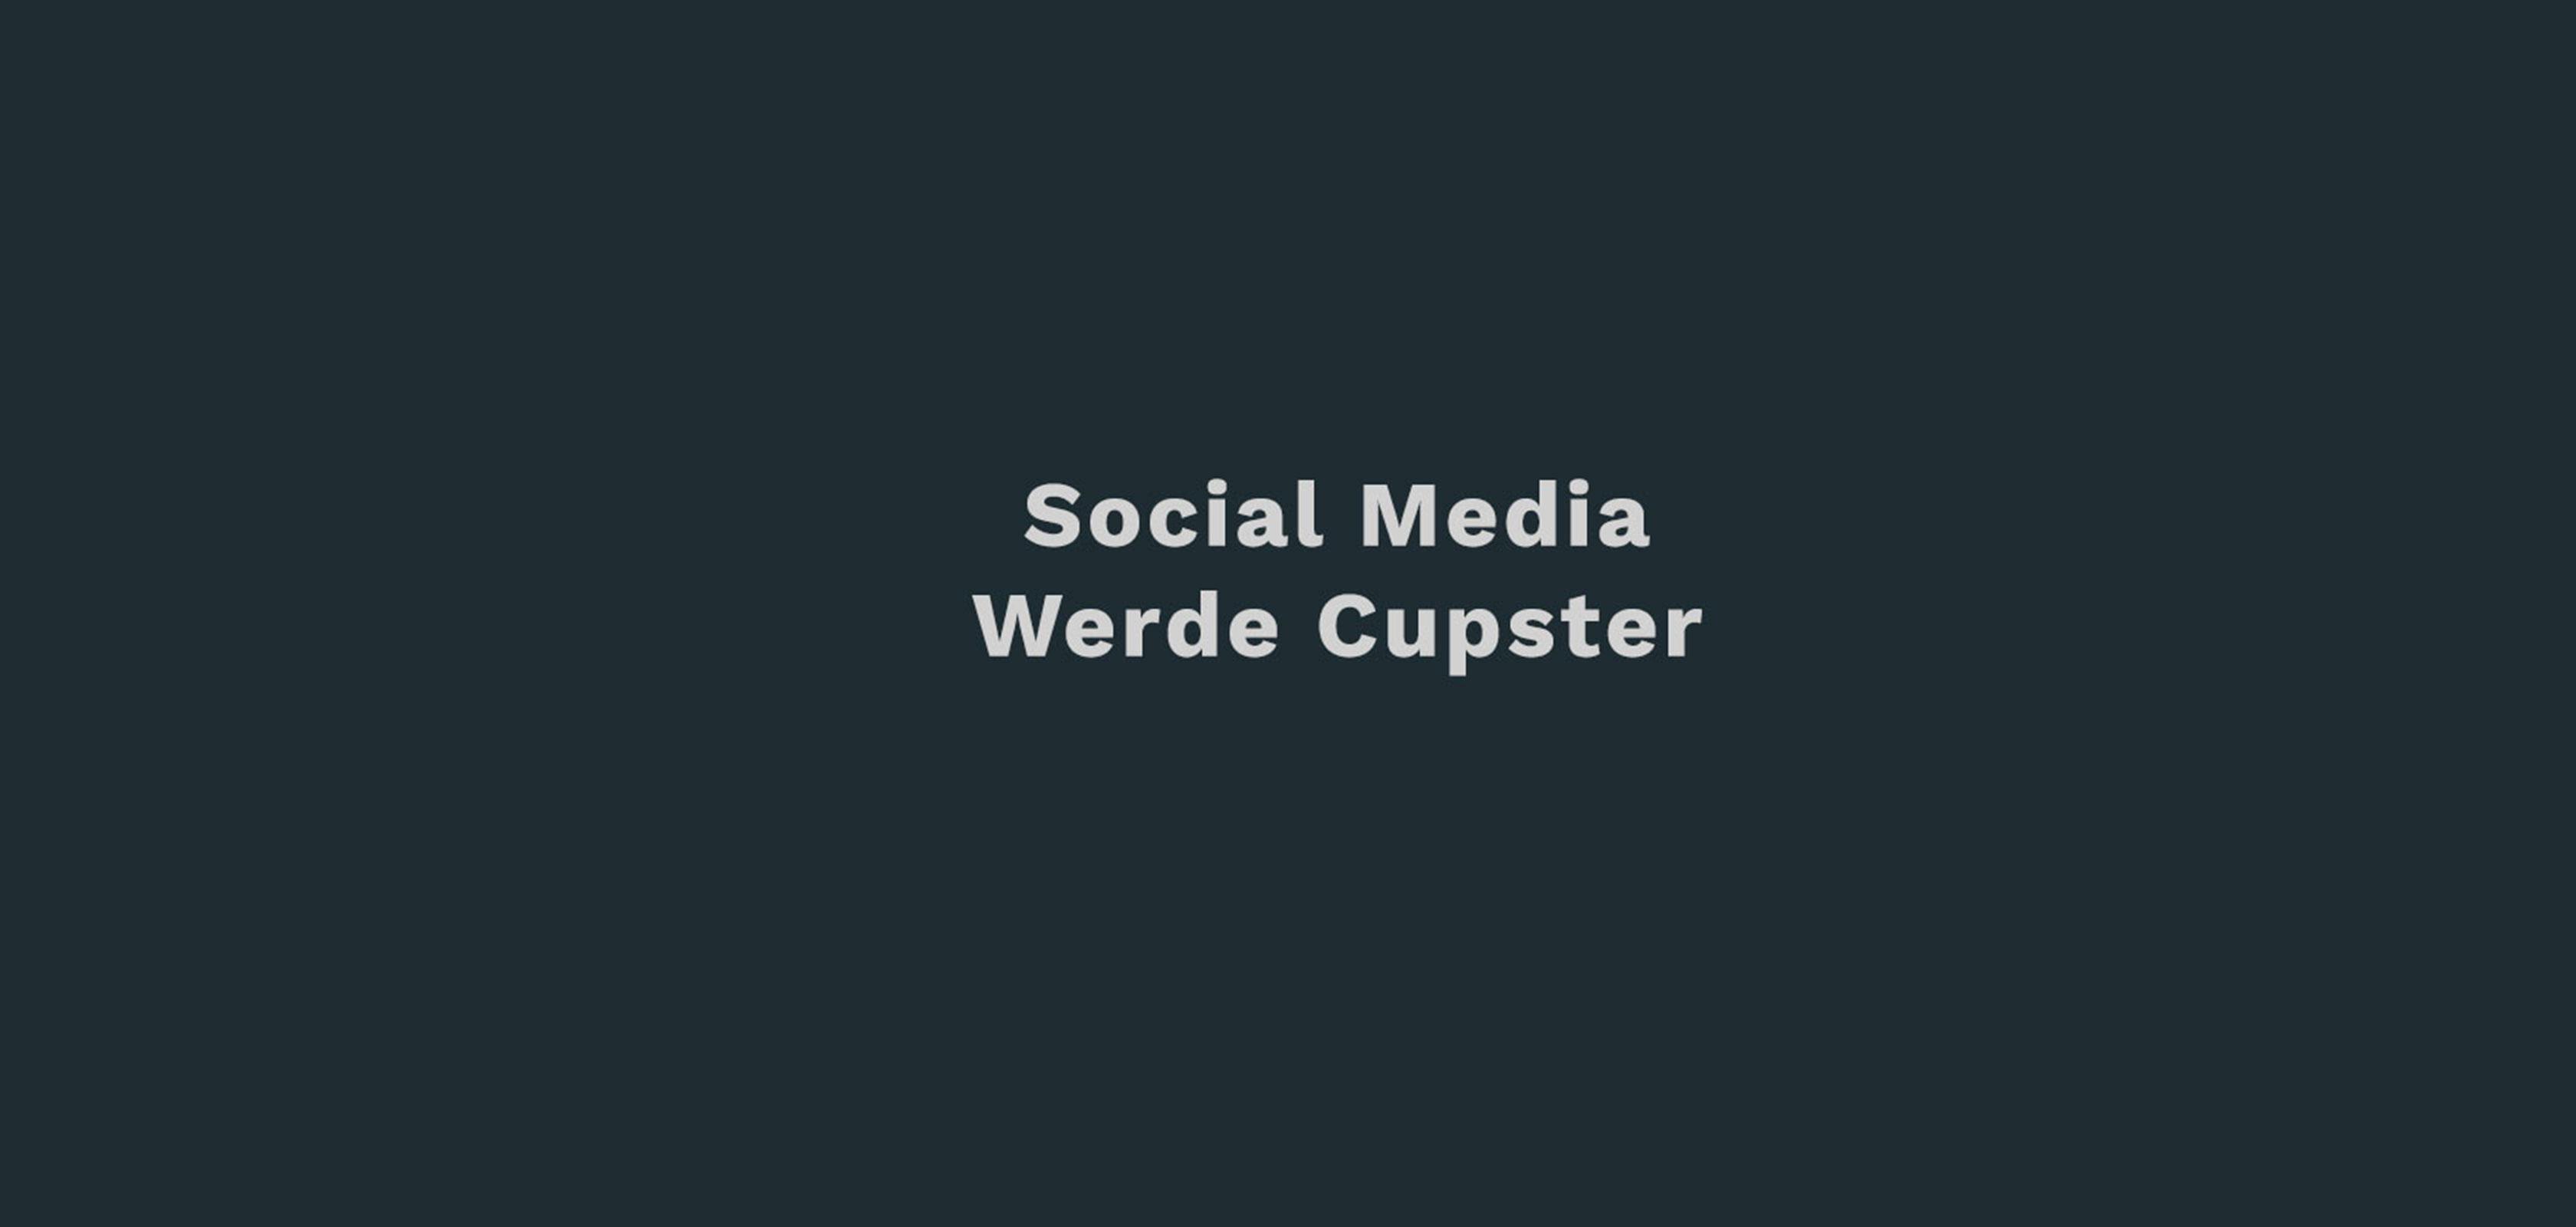 Werde-Cupster-DZP-Social-Media